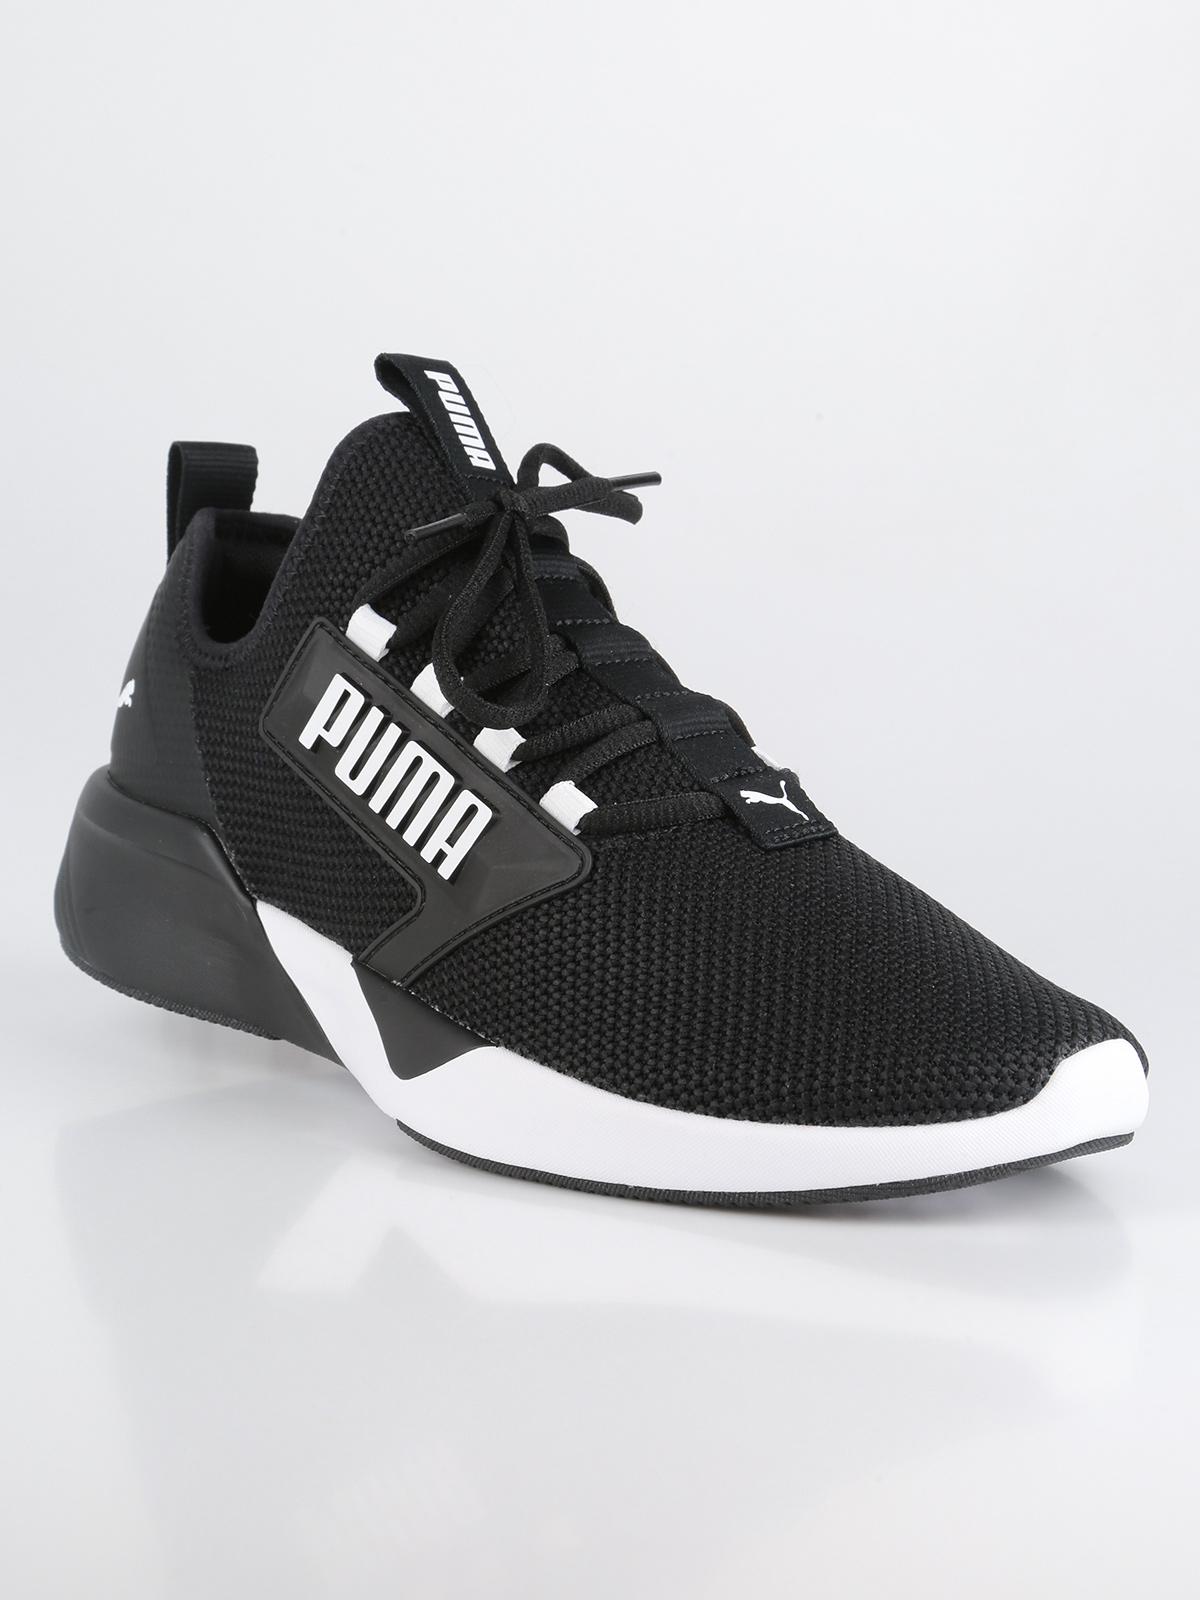 PUMA Retaliate black sneakers Fitness